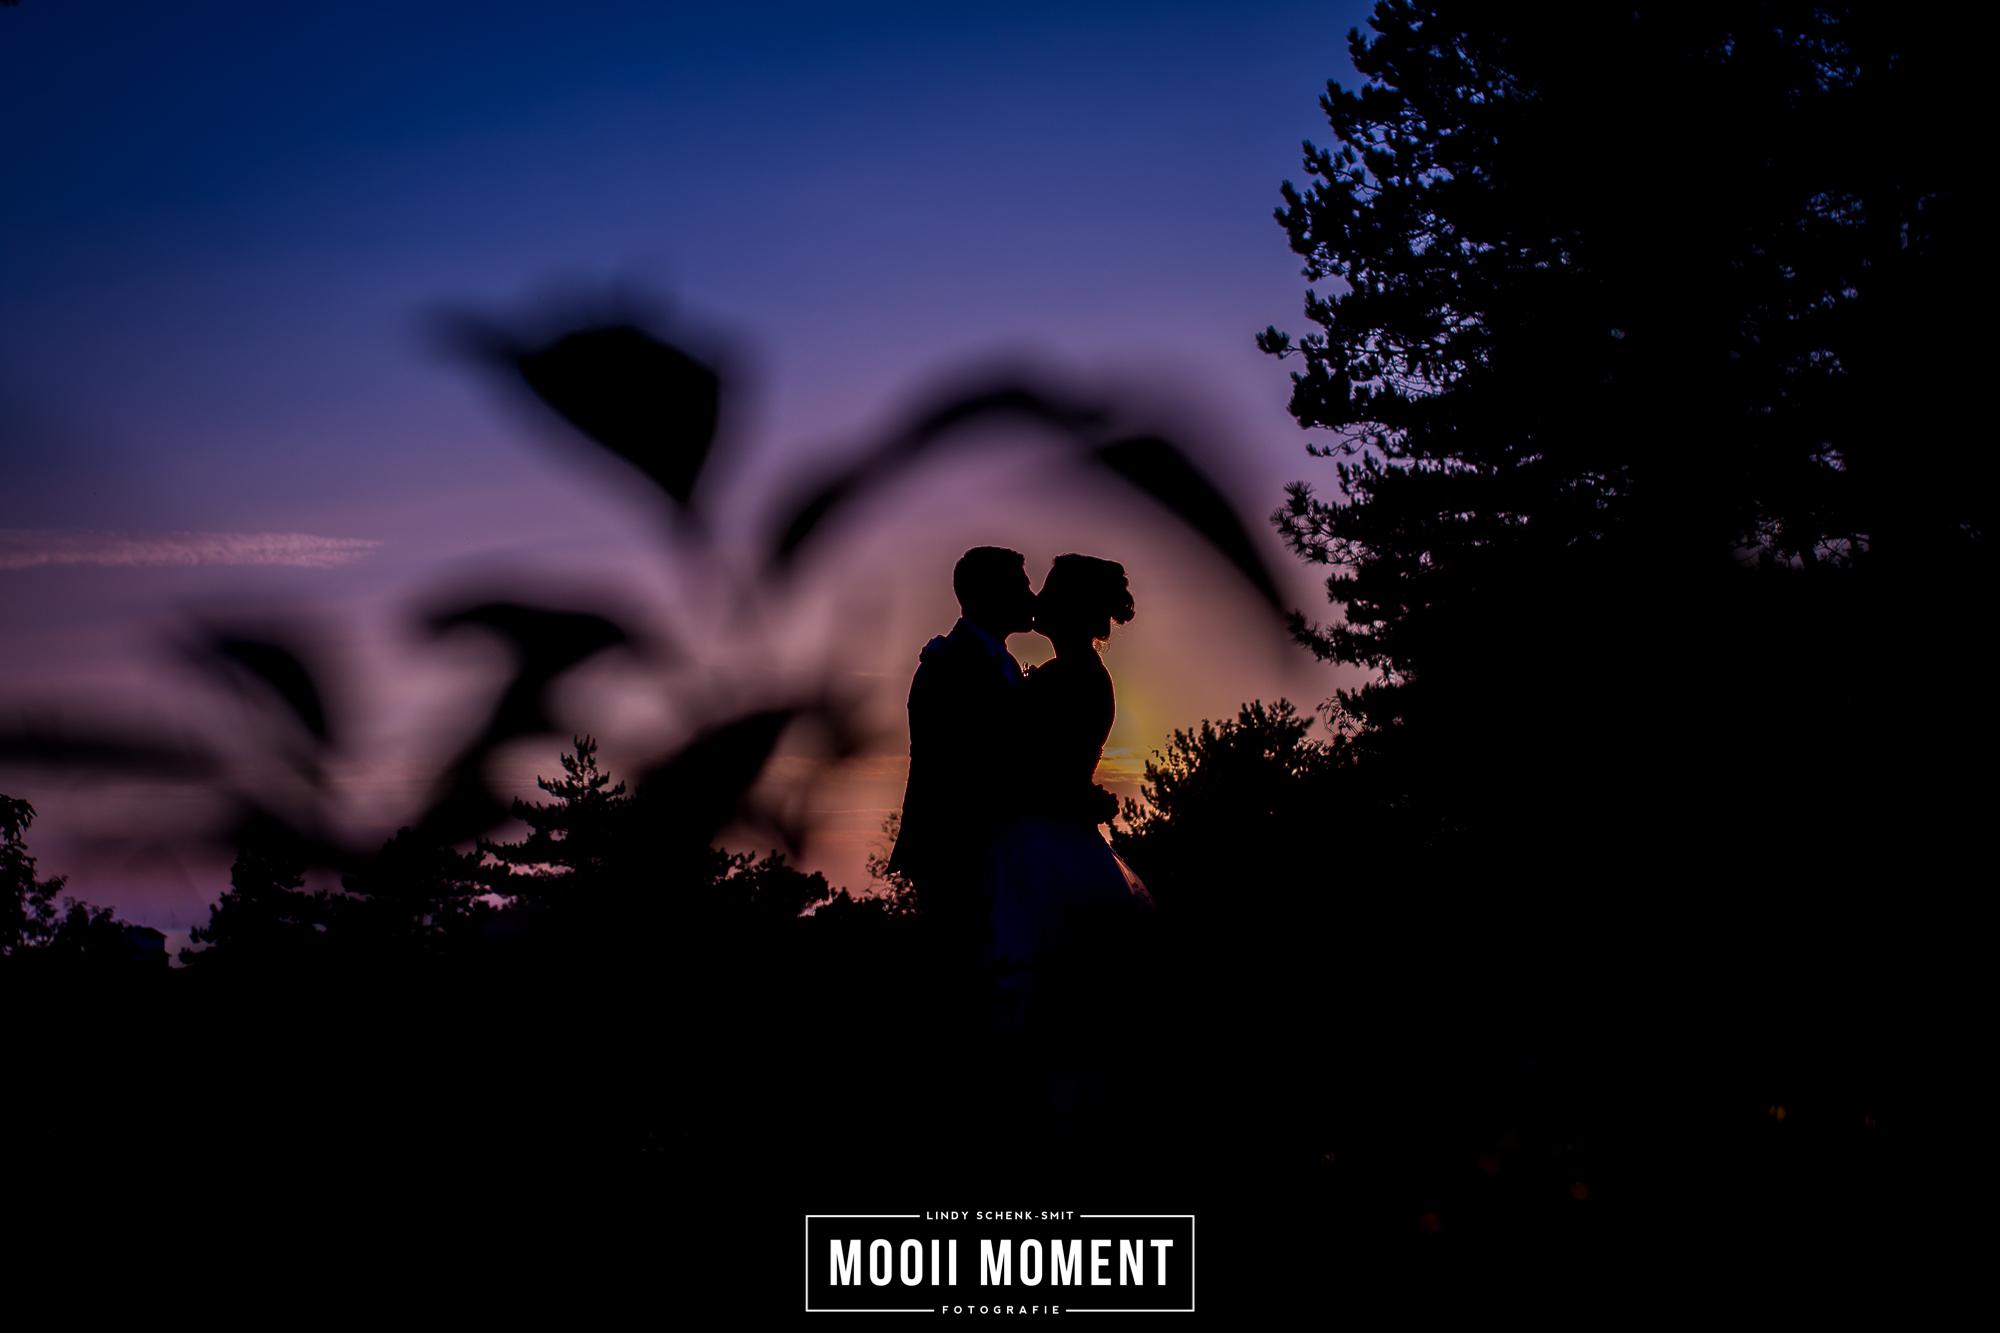 mooii-moment-bruioft-16-09-97